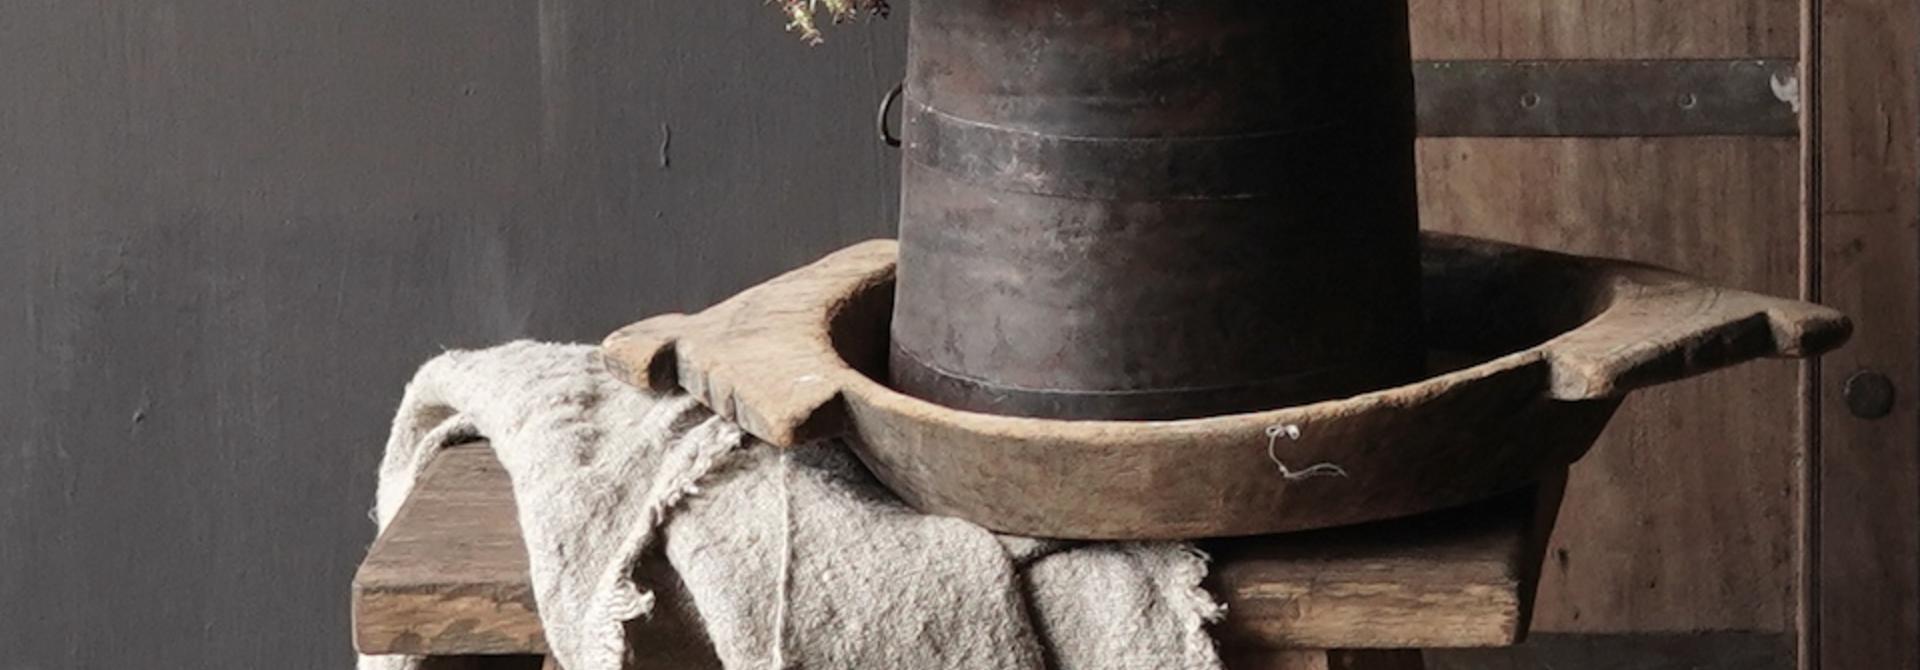 Nepalese iron pot